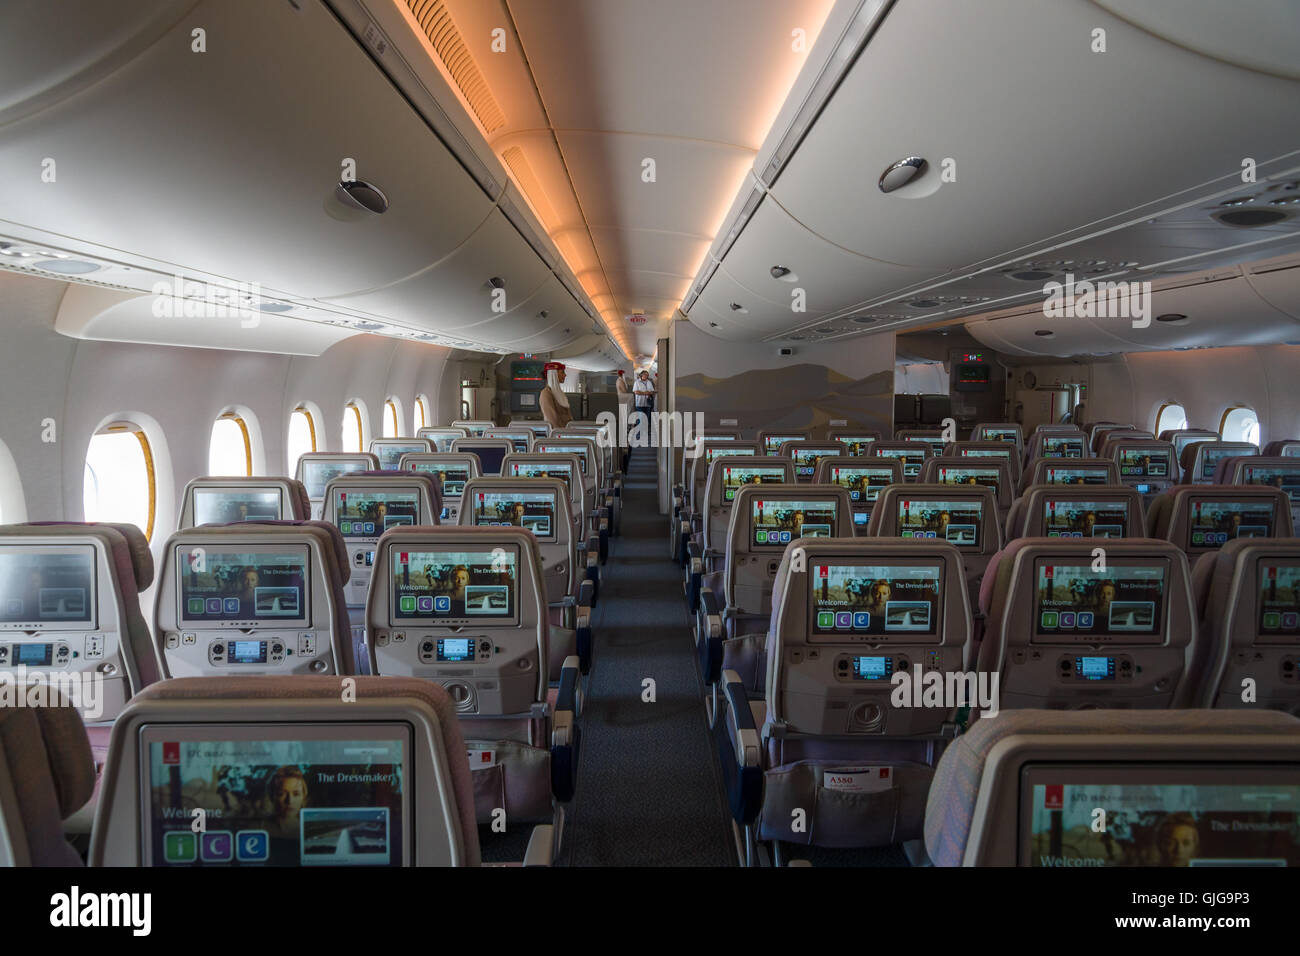 A380 airbus interior stock photos a380 airbus interior for Airbus a380 interior